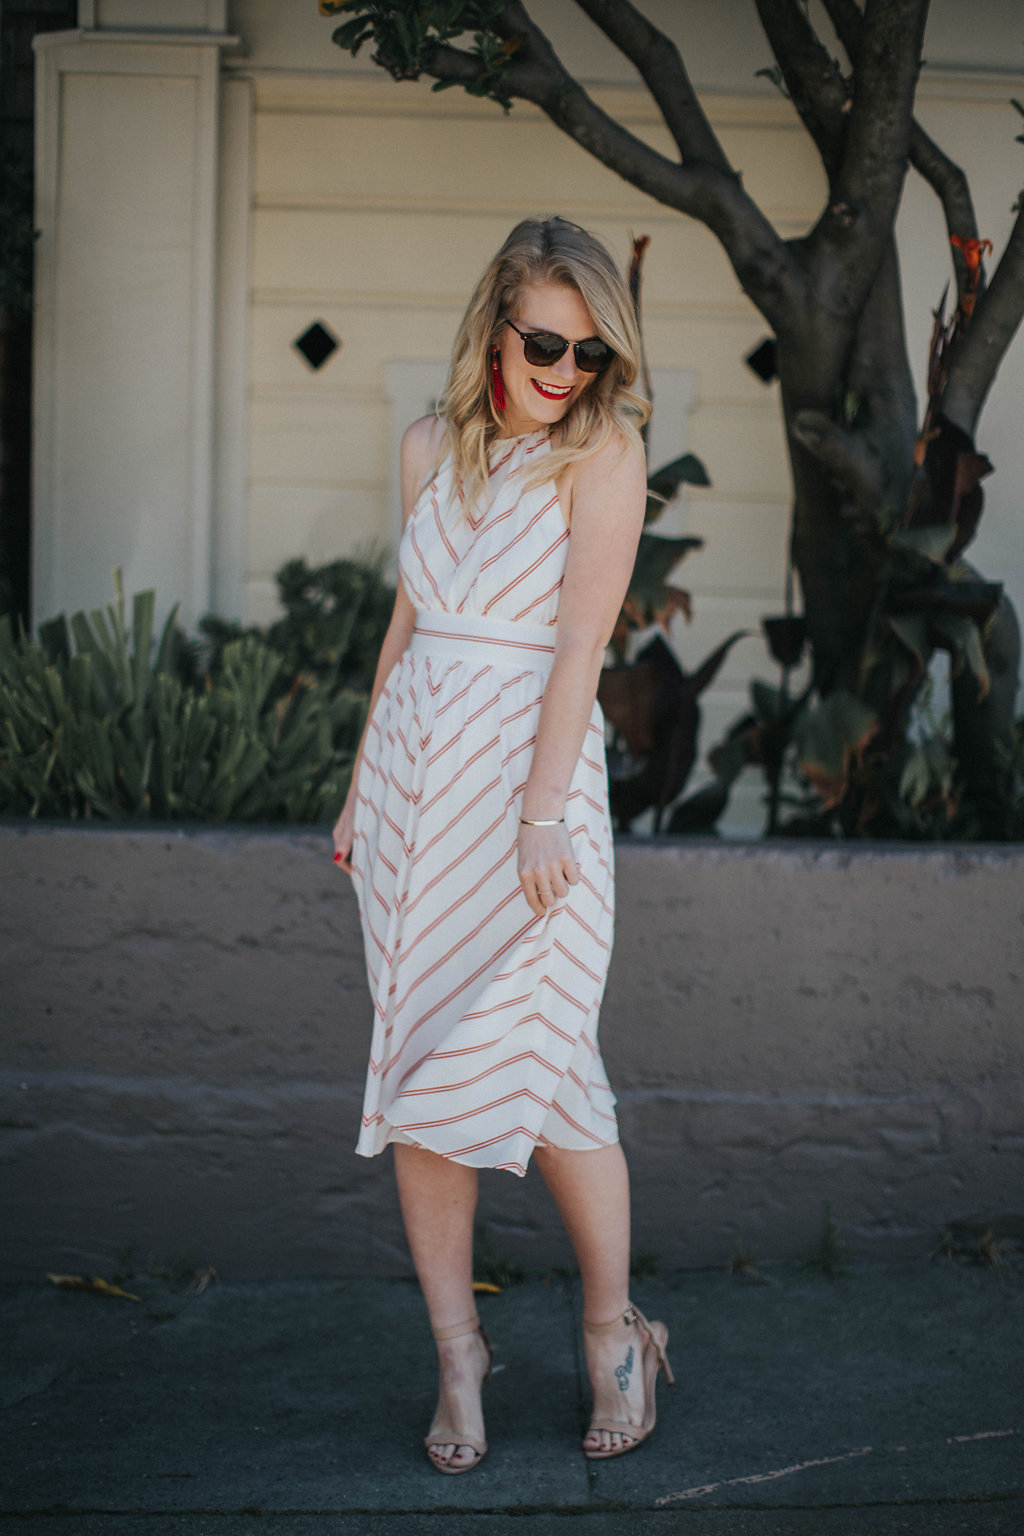 Cait Weingartner wears a swingy striped Club Monaco dress with Loeffler Randall heels and BaubleBar earrings.